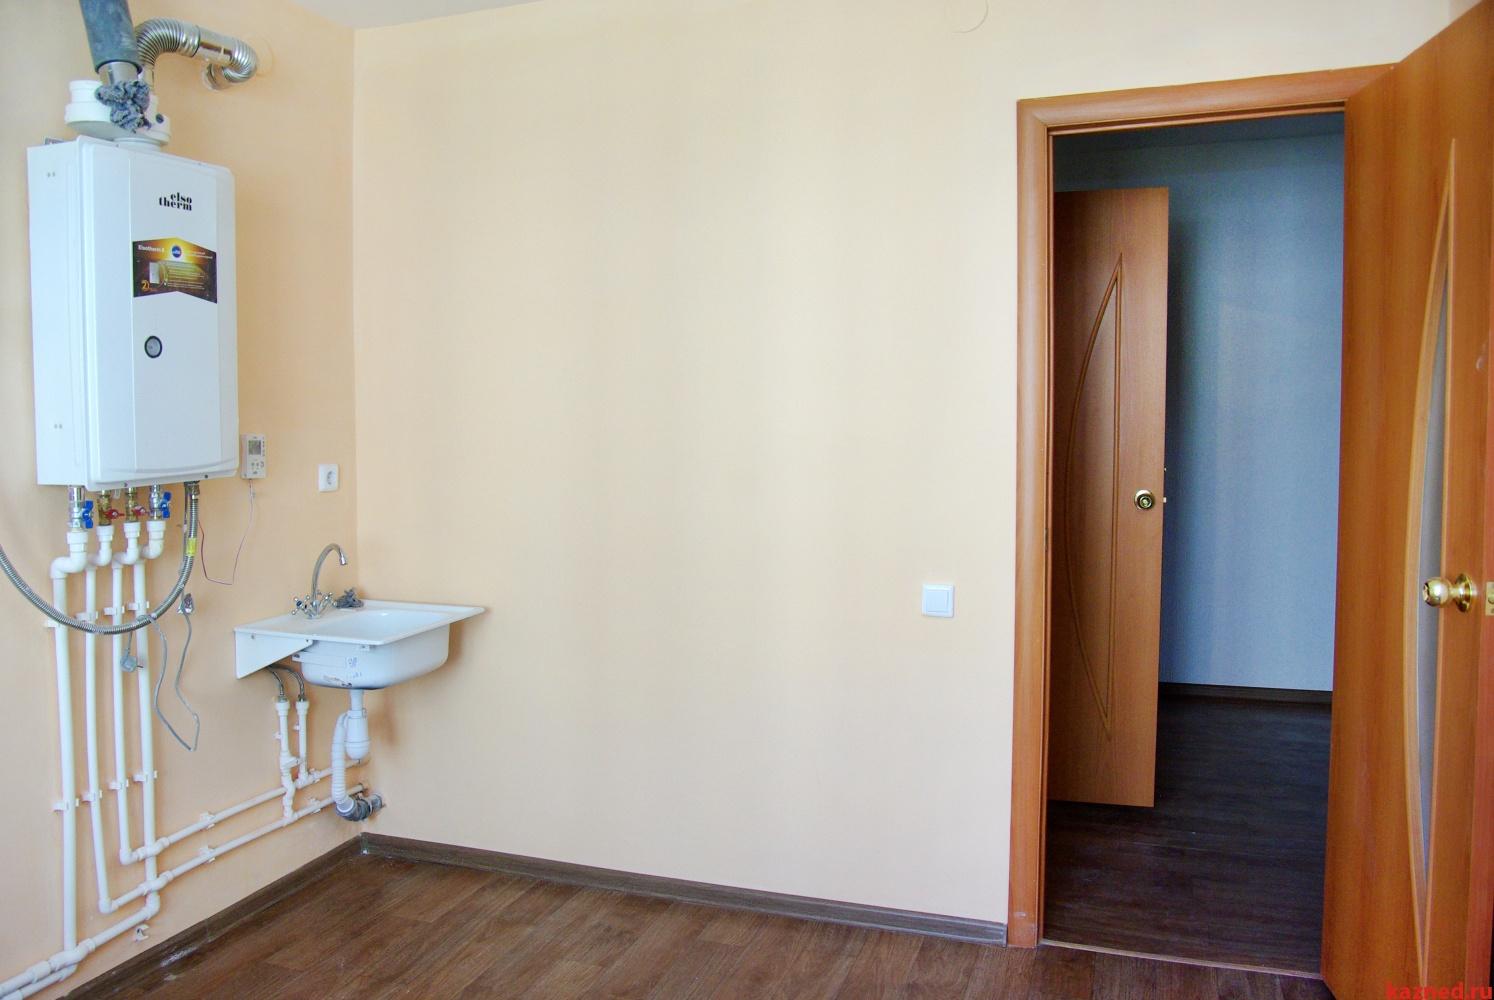 Продажа 2-к квартиры Лукина д.52, 68 м²  (миниатюра №4)